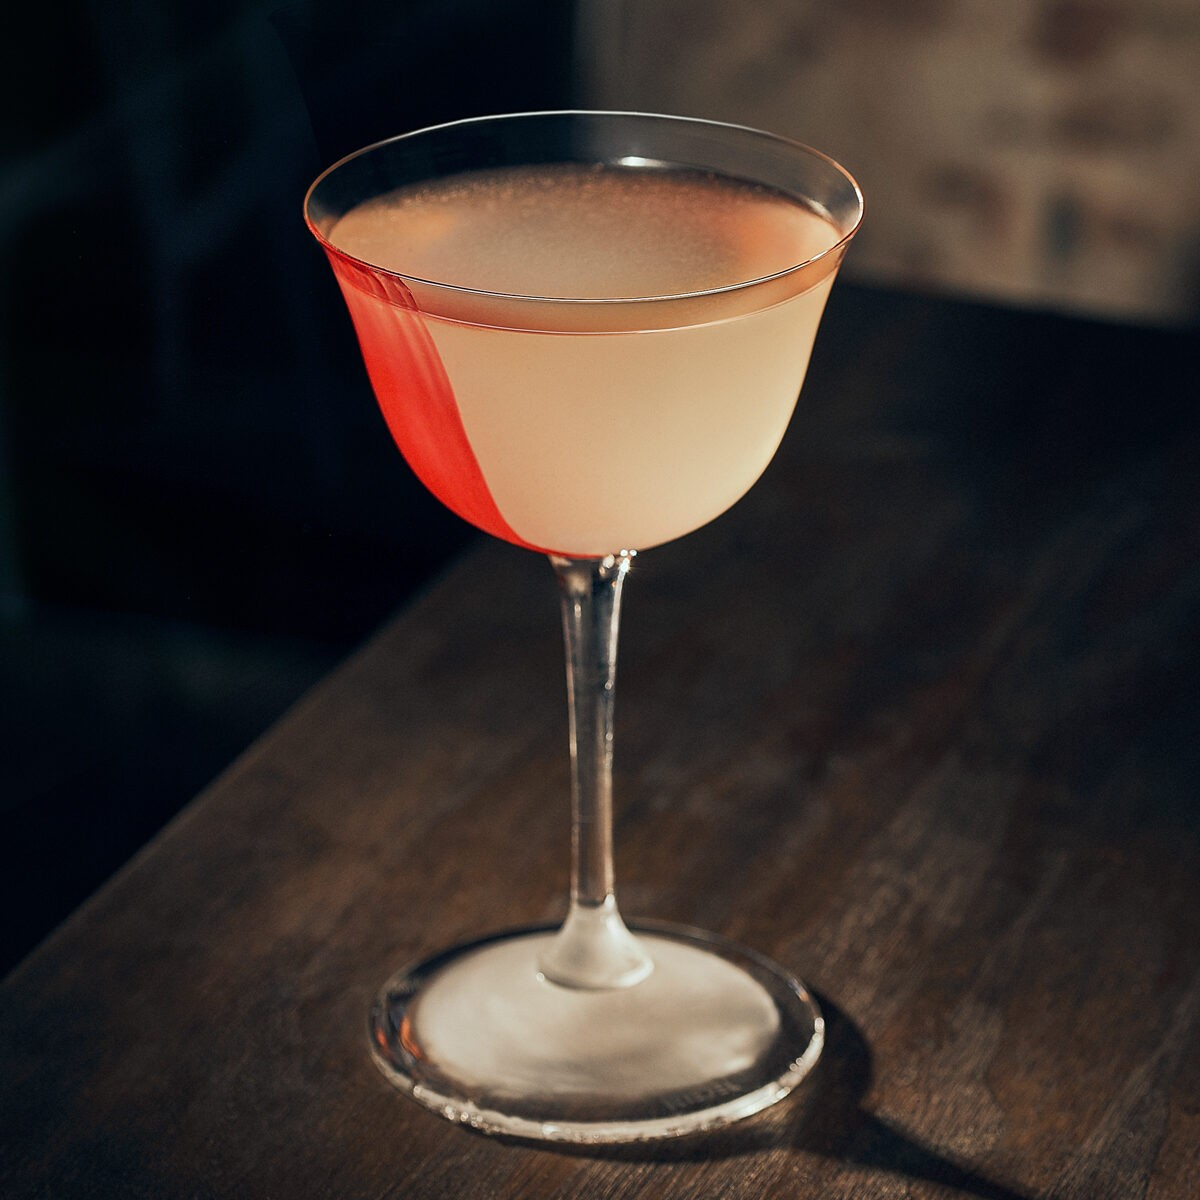 Grosera cocktail at Tres Monos